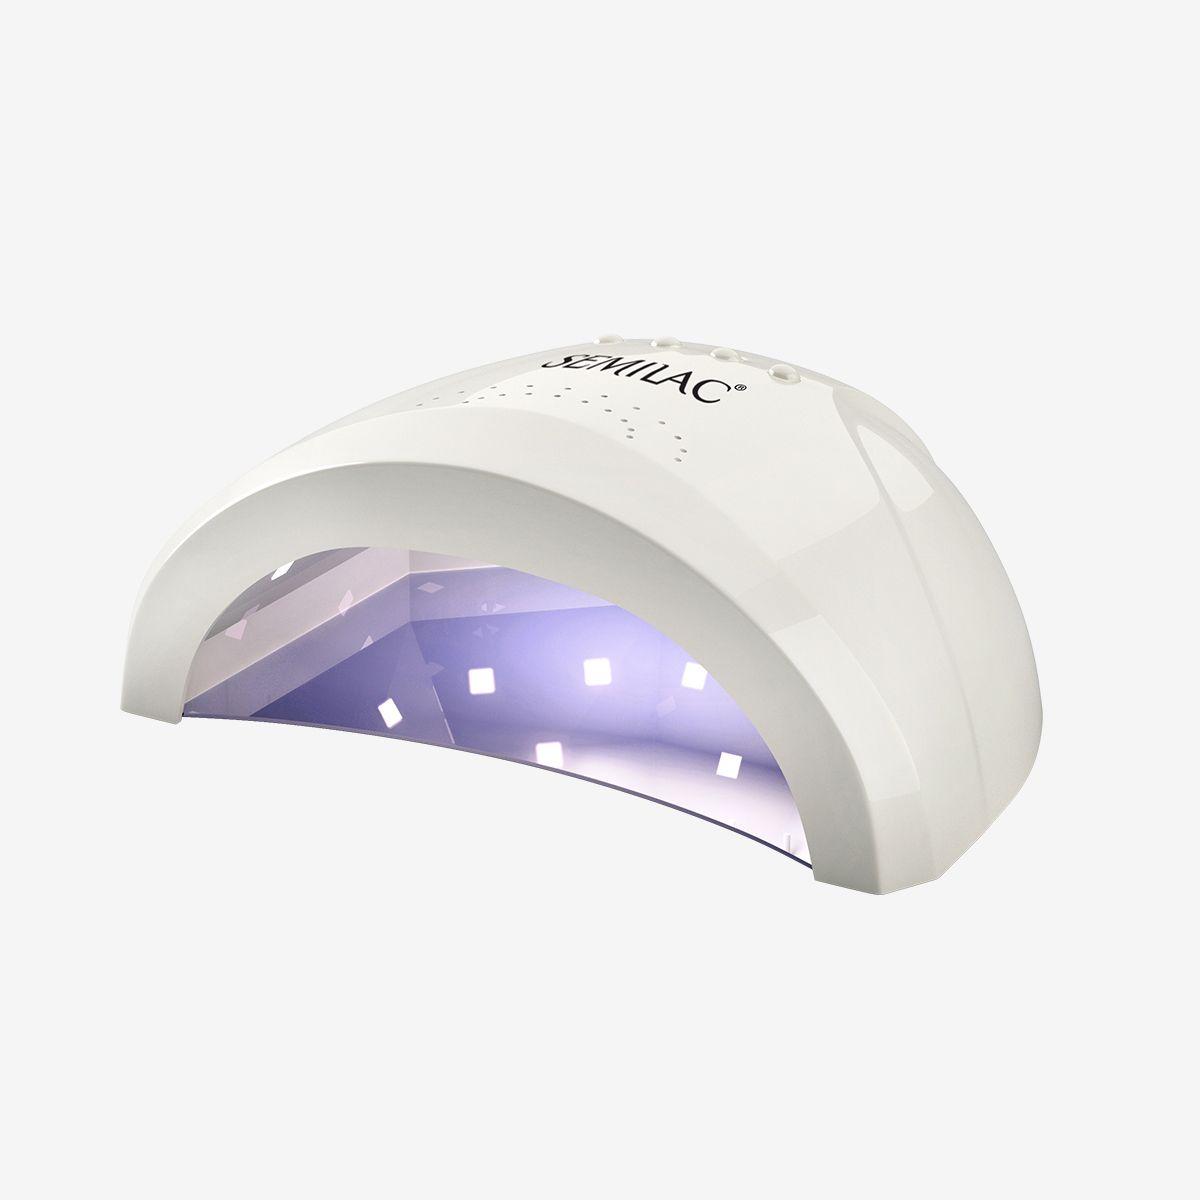 lampa-uv-led-48-24w-semilac_1.jpg